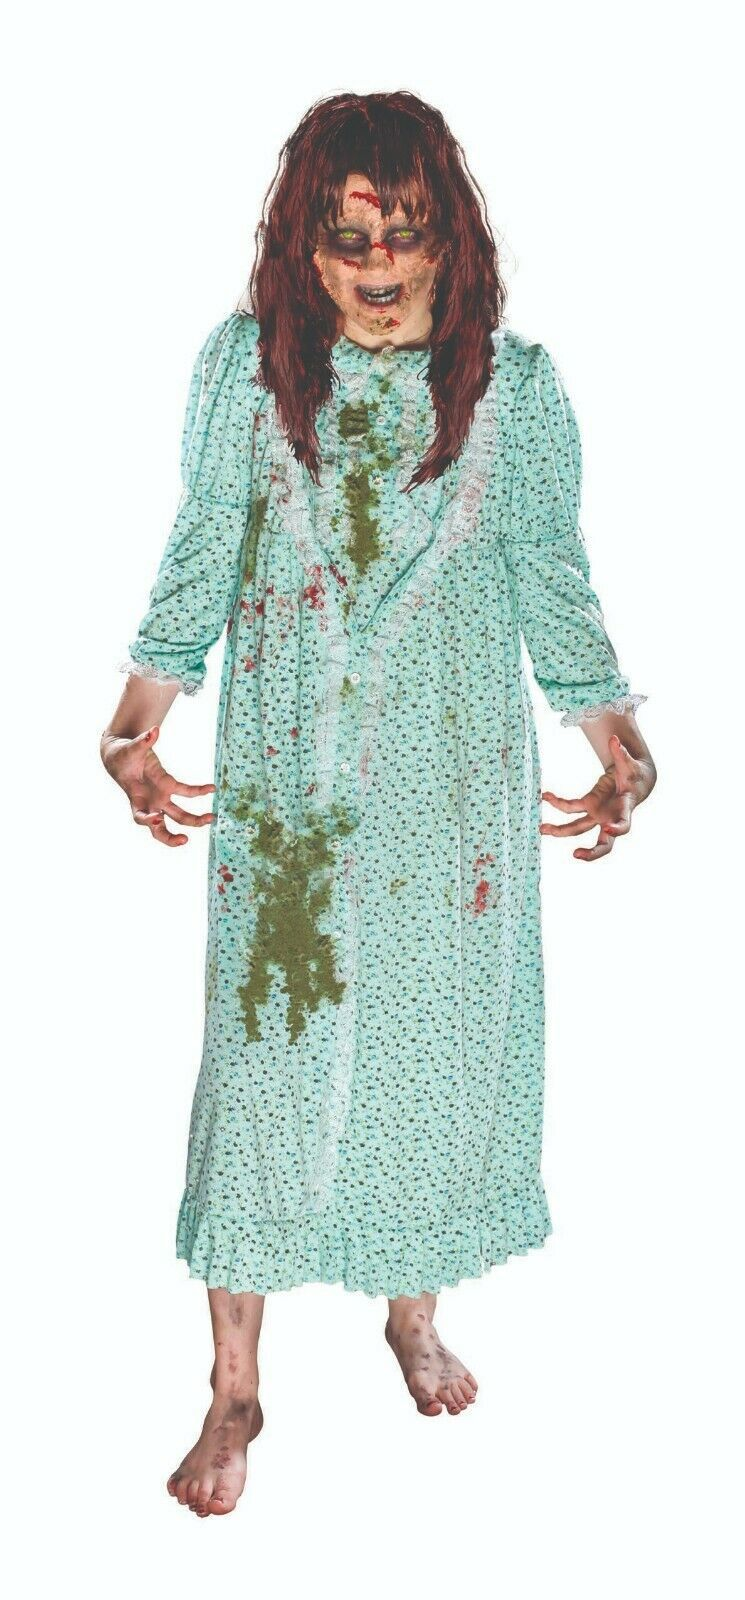 Morbid Enterprises The Exorcist Regan Demonic Adult Halloween Costume M36844